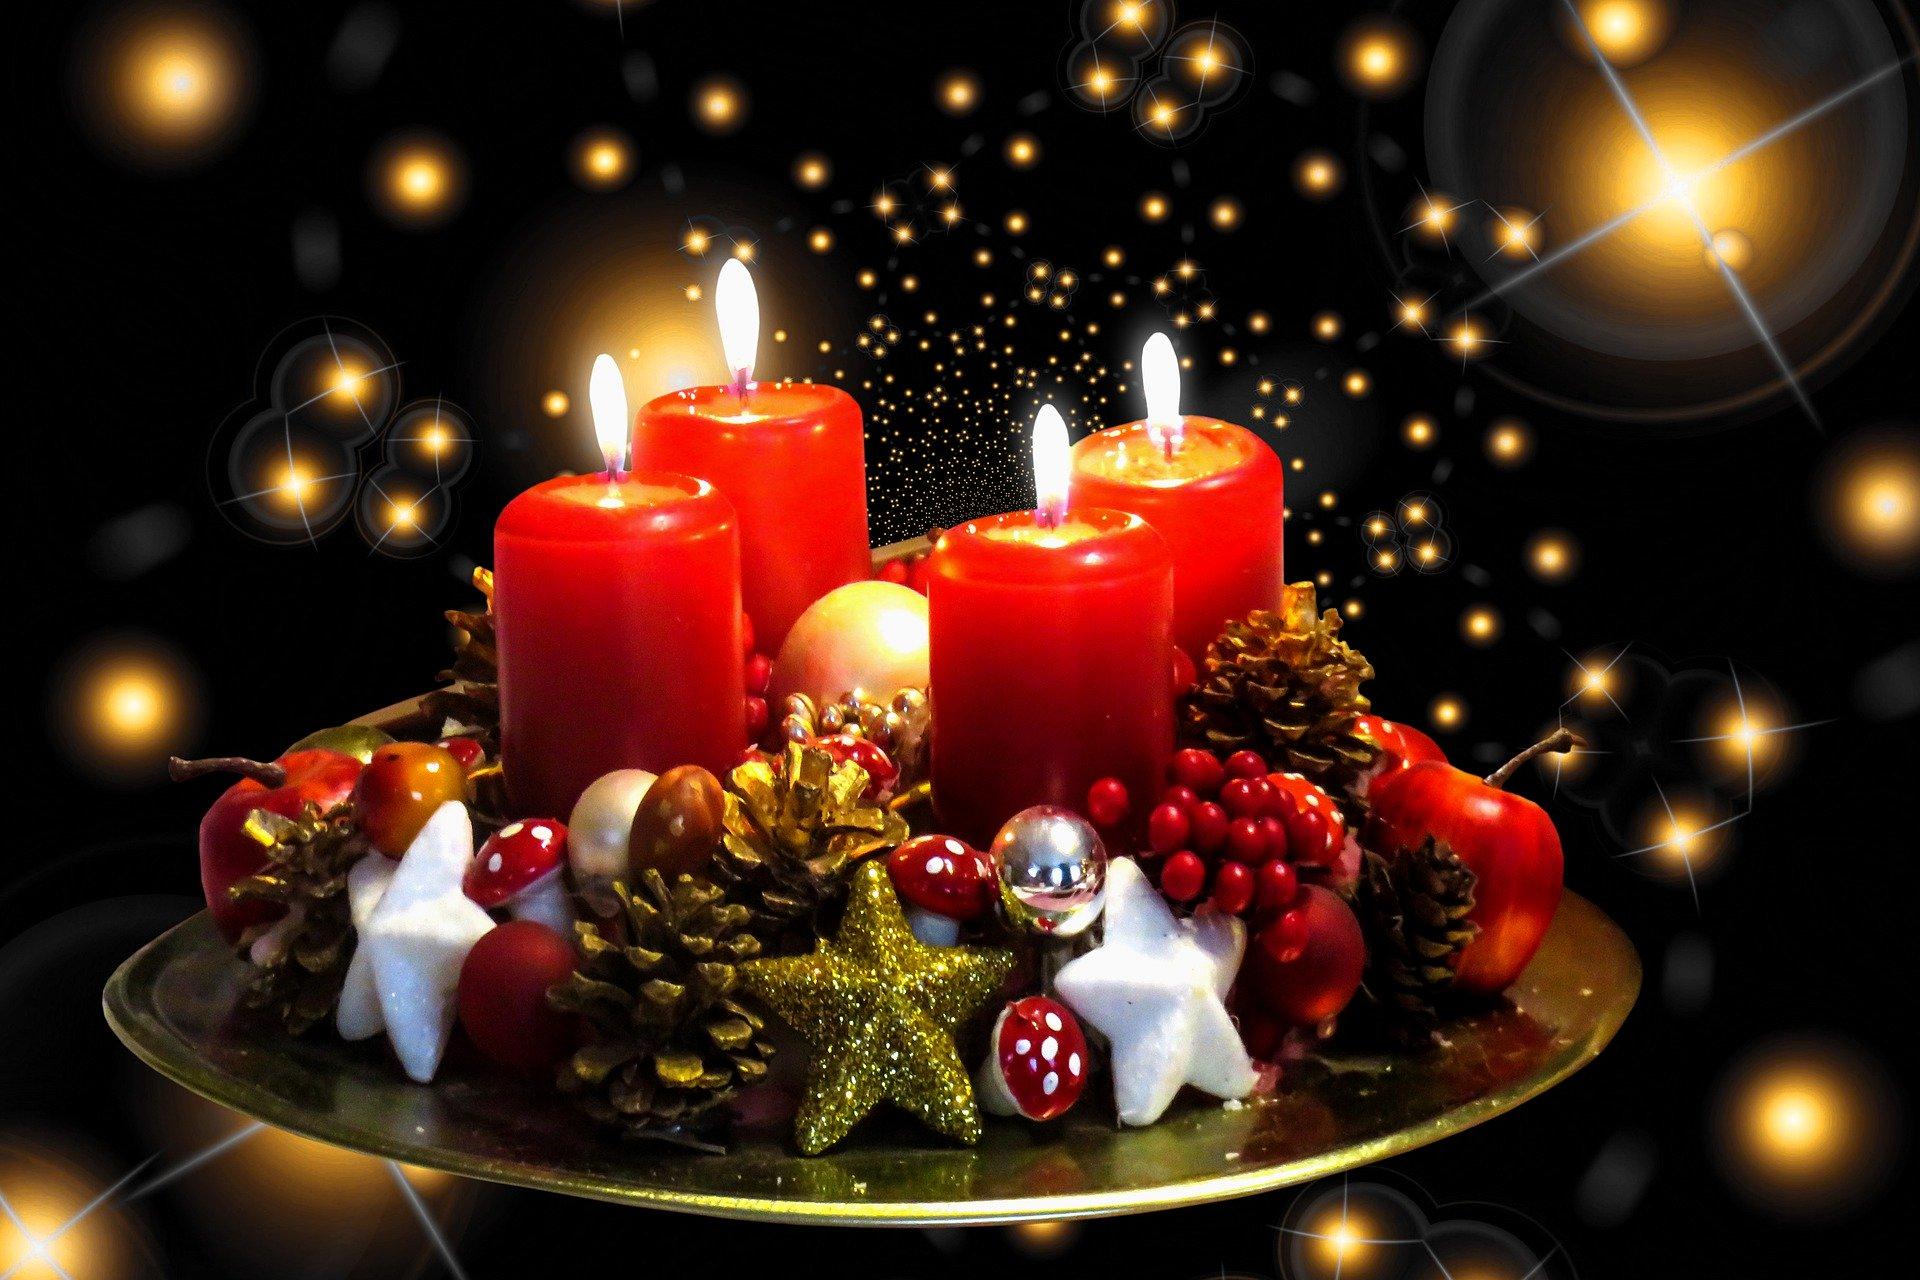 降臨燭台(聖誕燭台)(圖/Gerhard Gellinger.Pixabay)